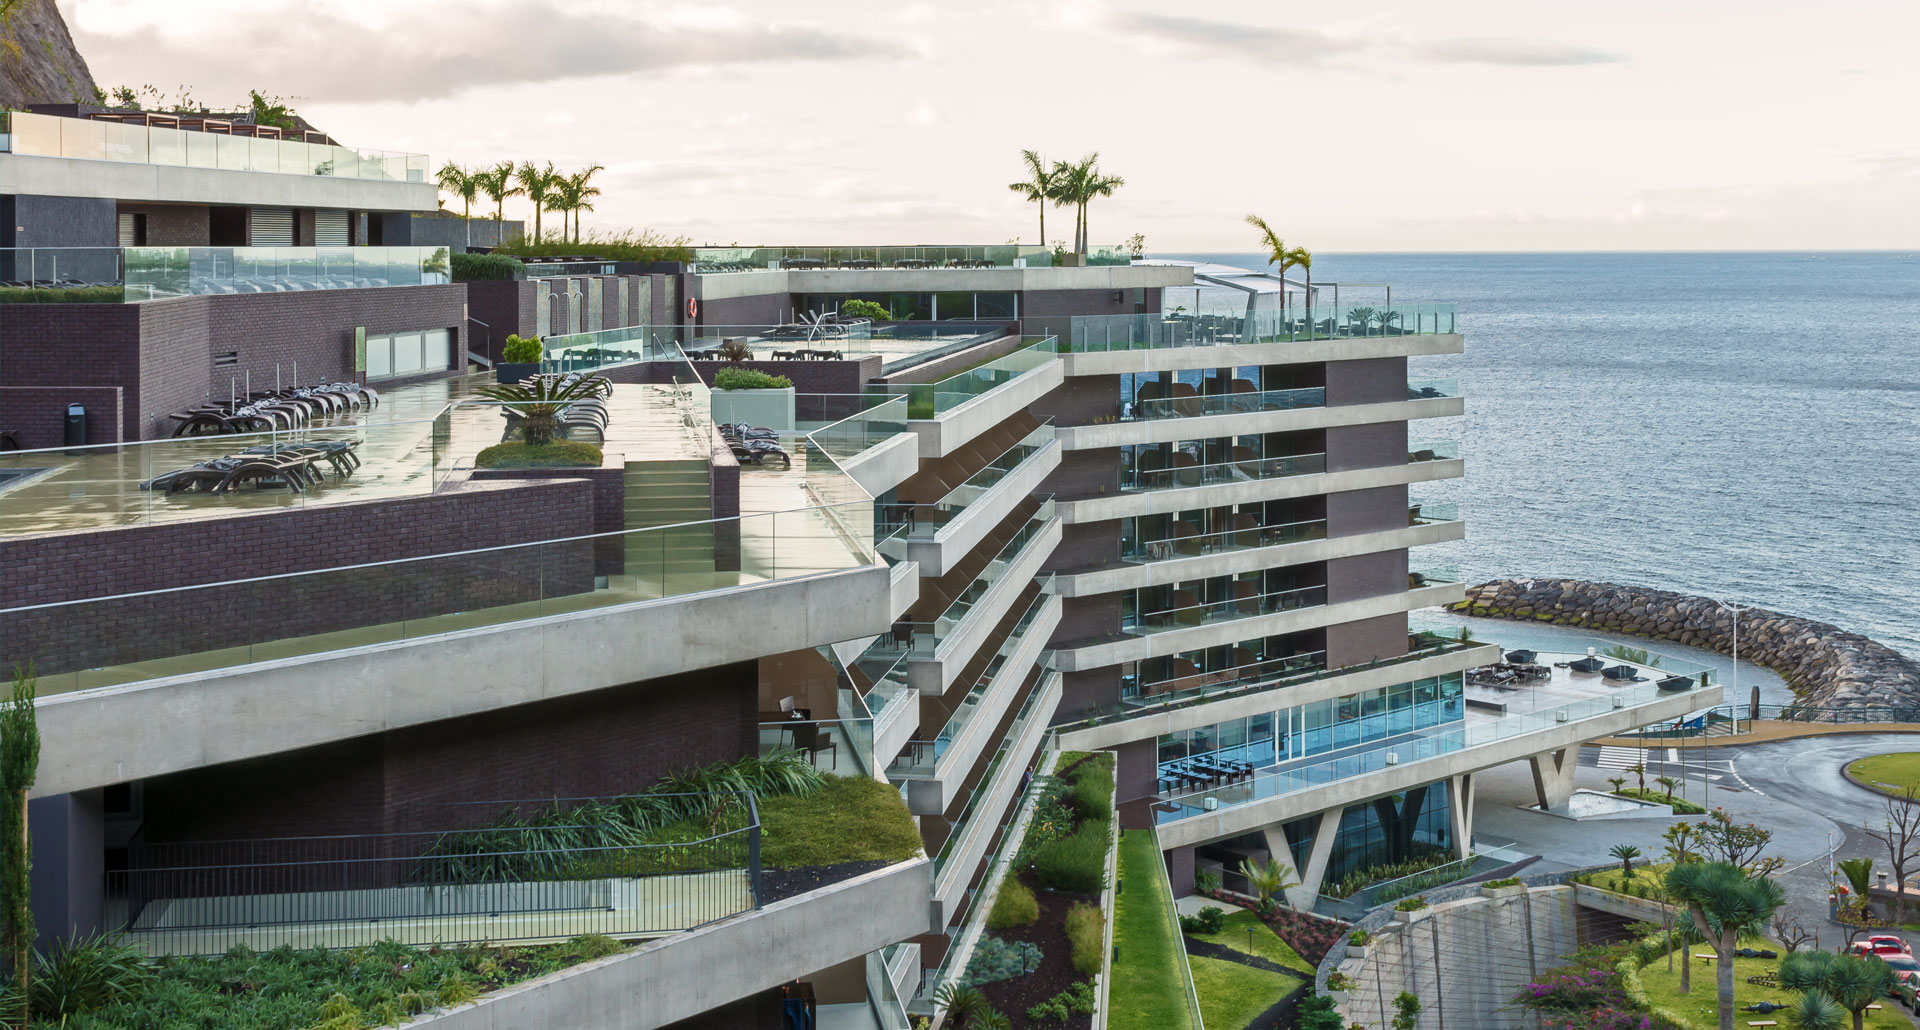 Saccharum - boutique hotel in Madeira